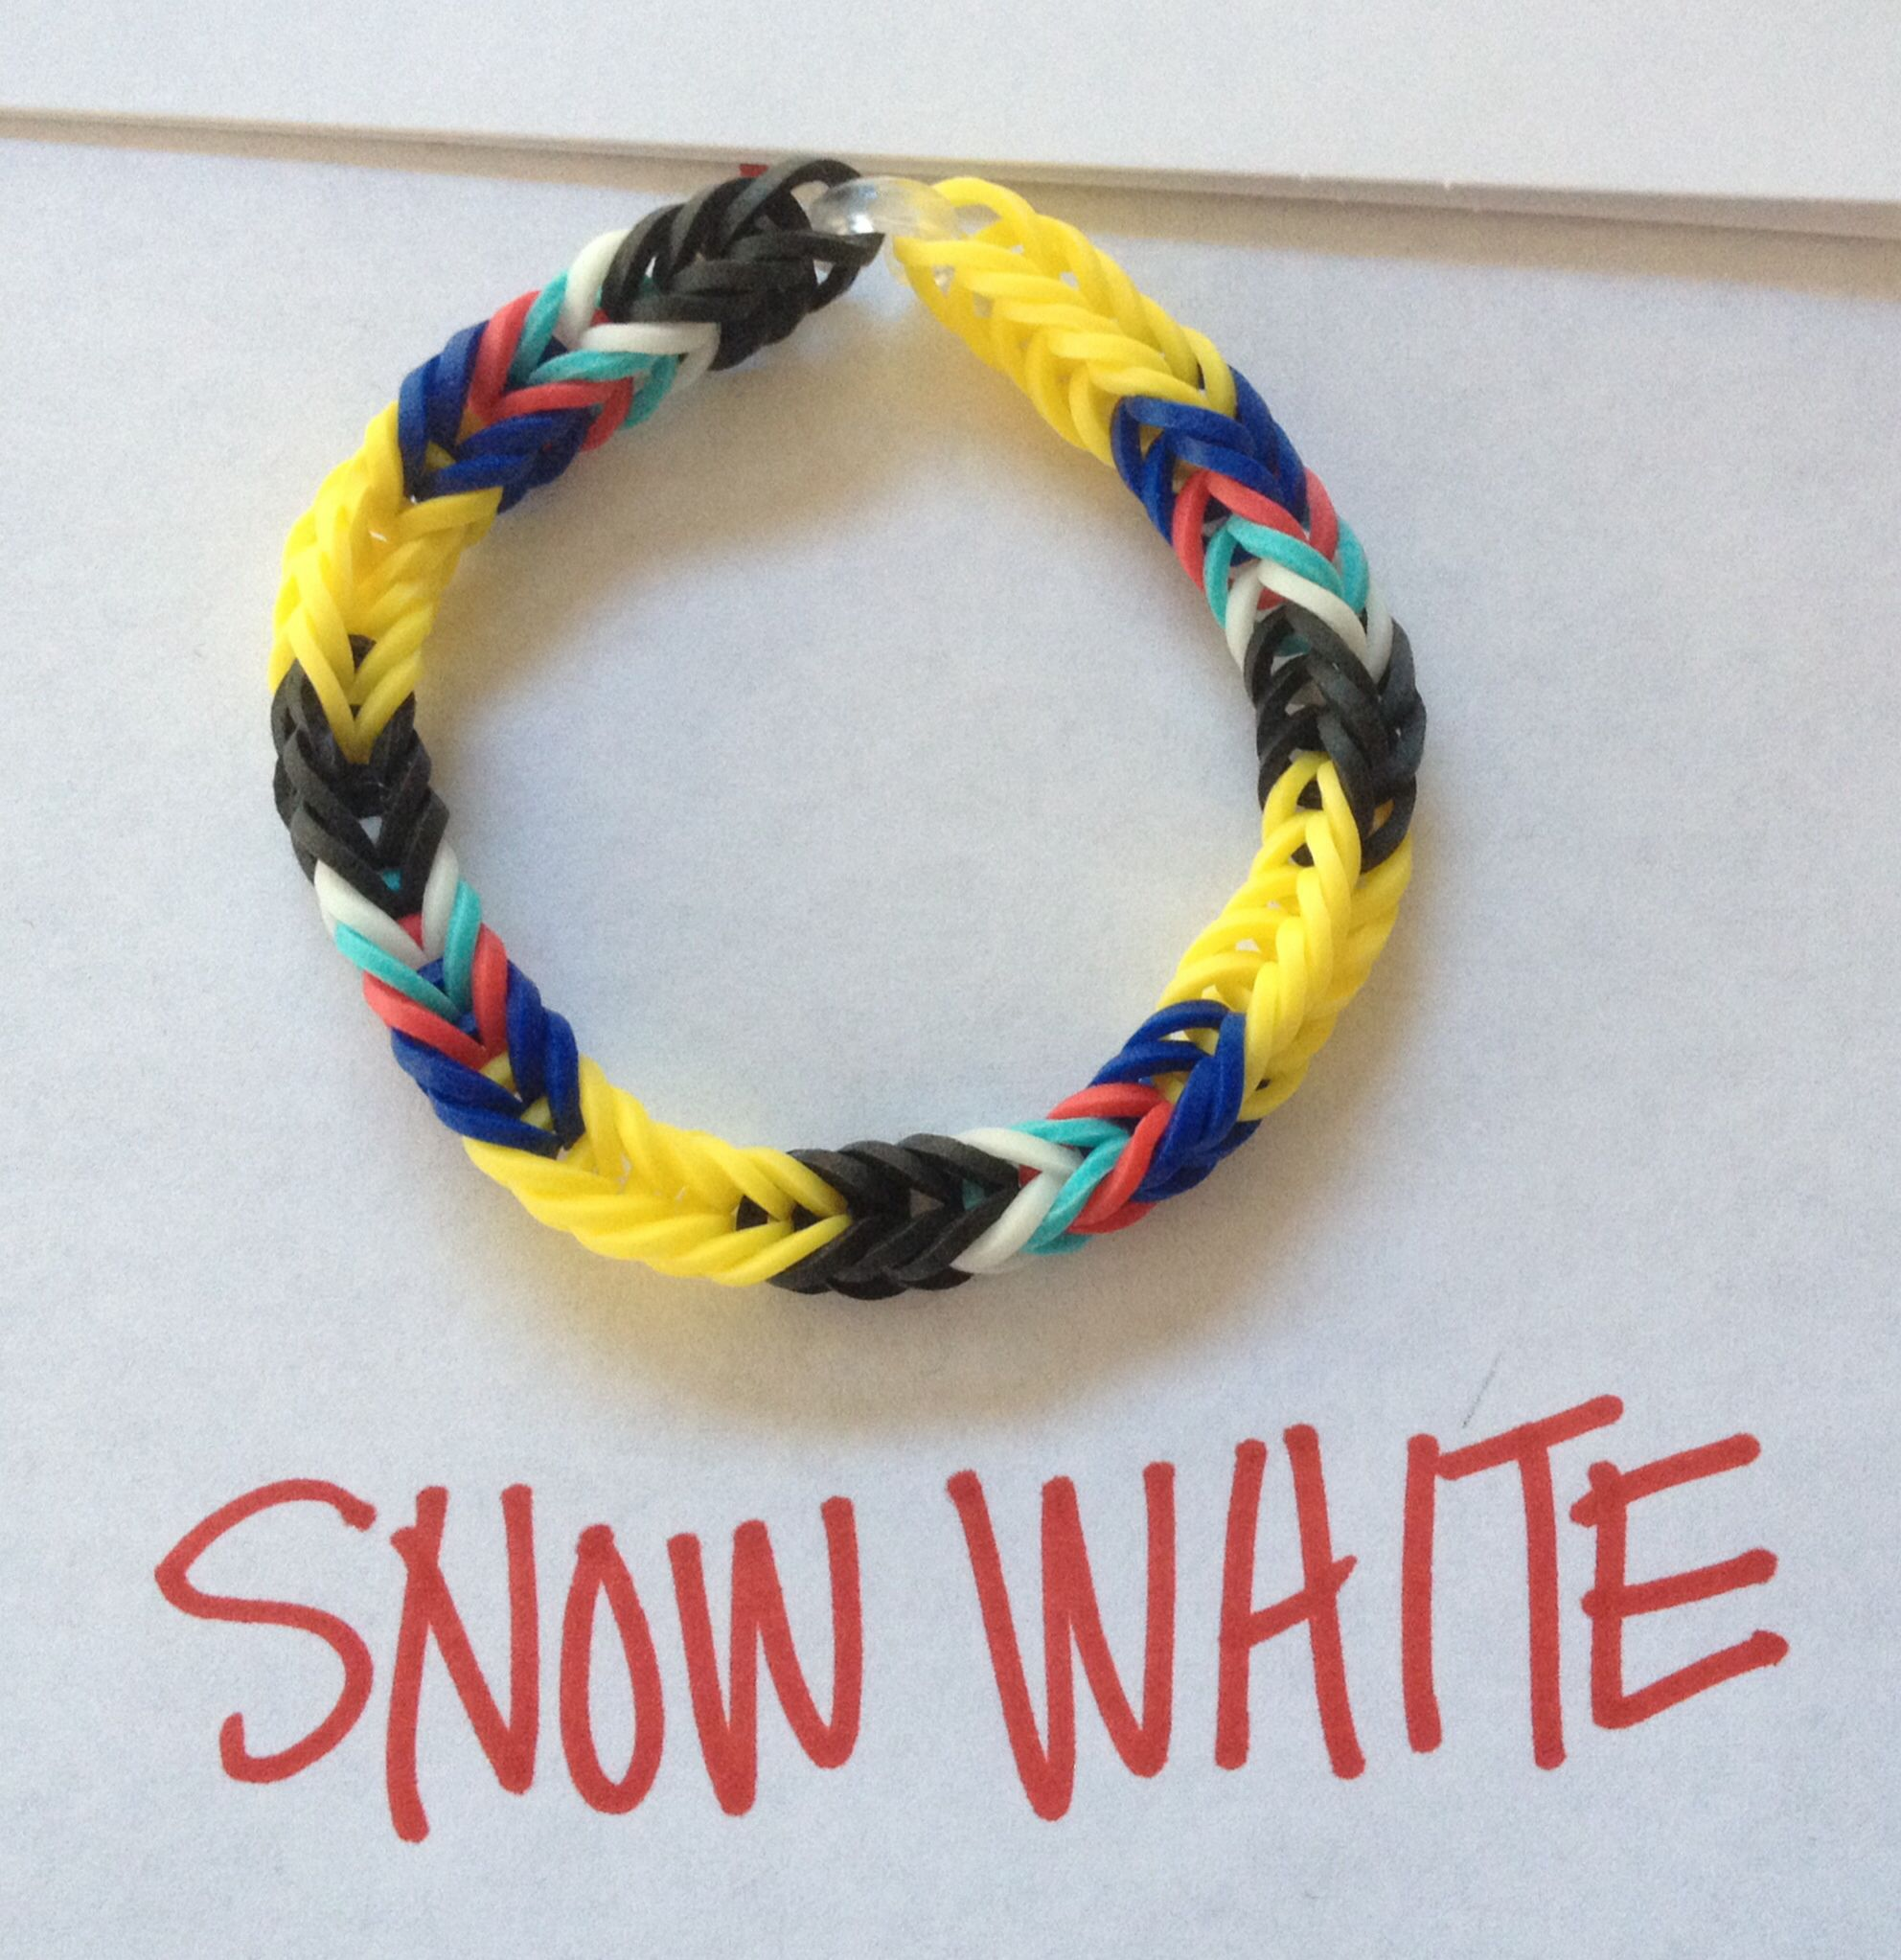 Disney Theme Rubber Band Bracelet: Snow White